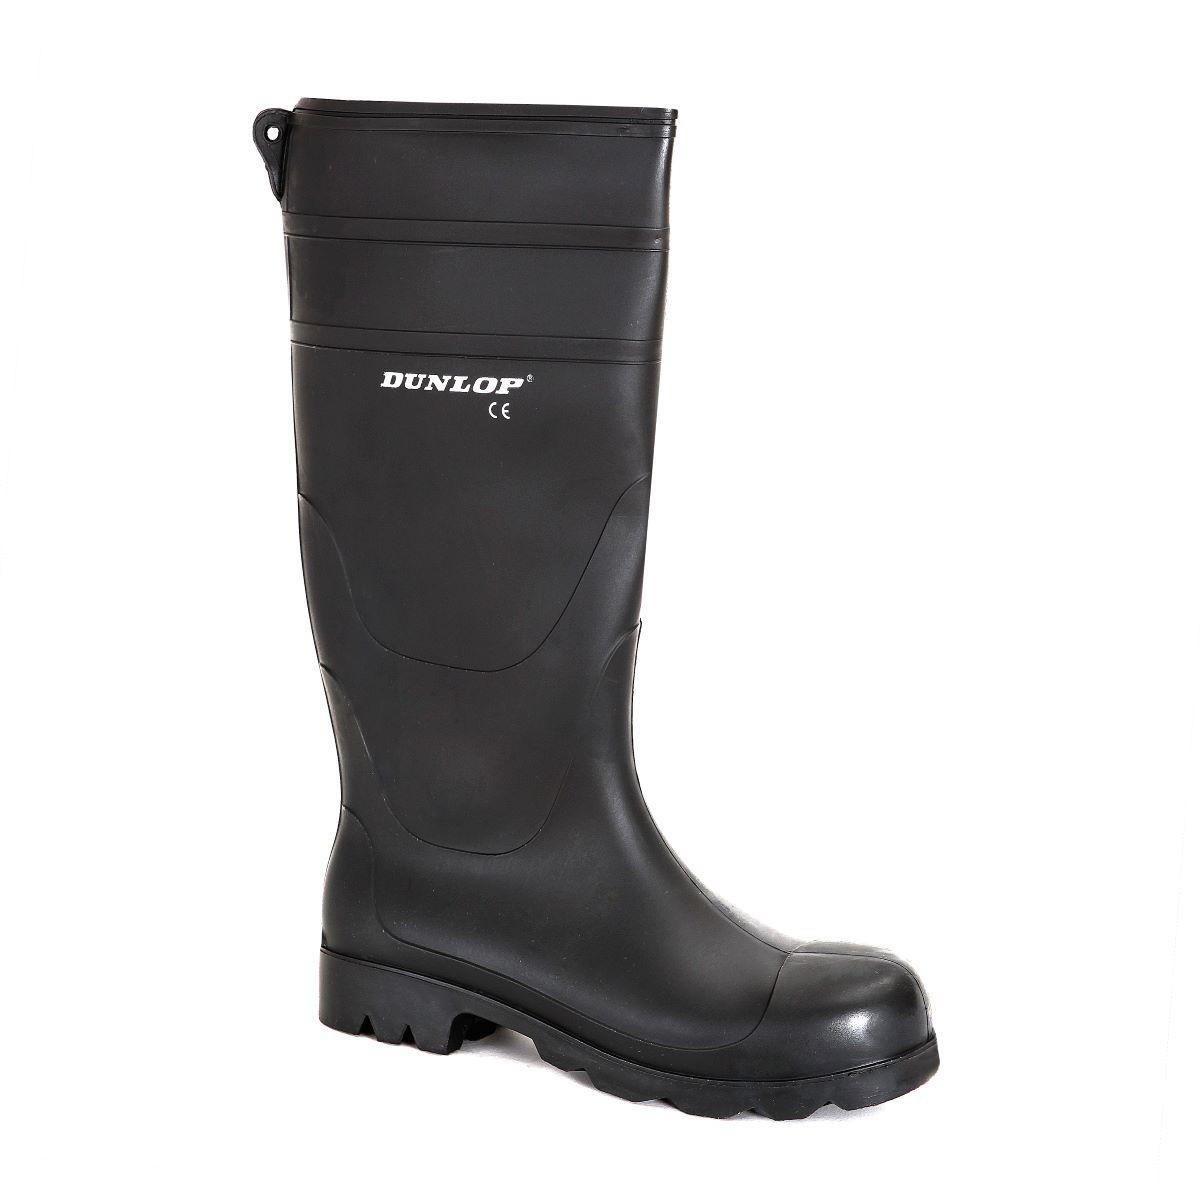 ČERNÝ DUNLOP UNIVERSAL 55310 obuv prac. 41